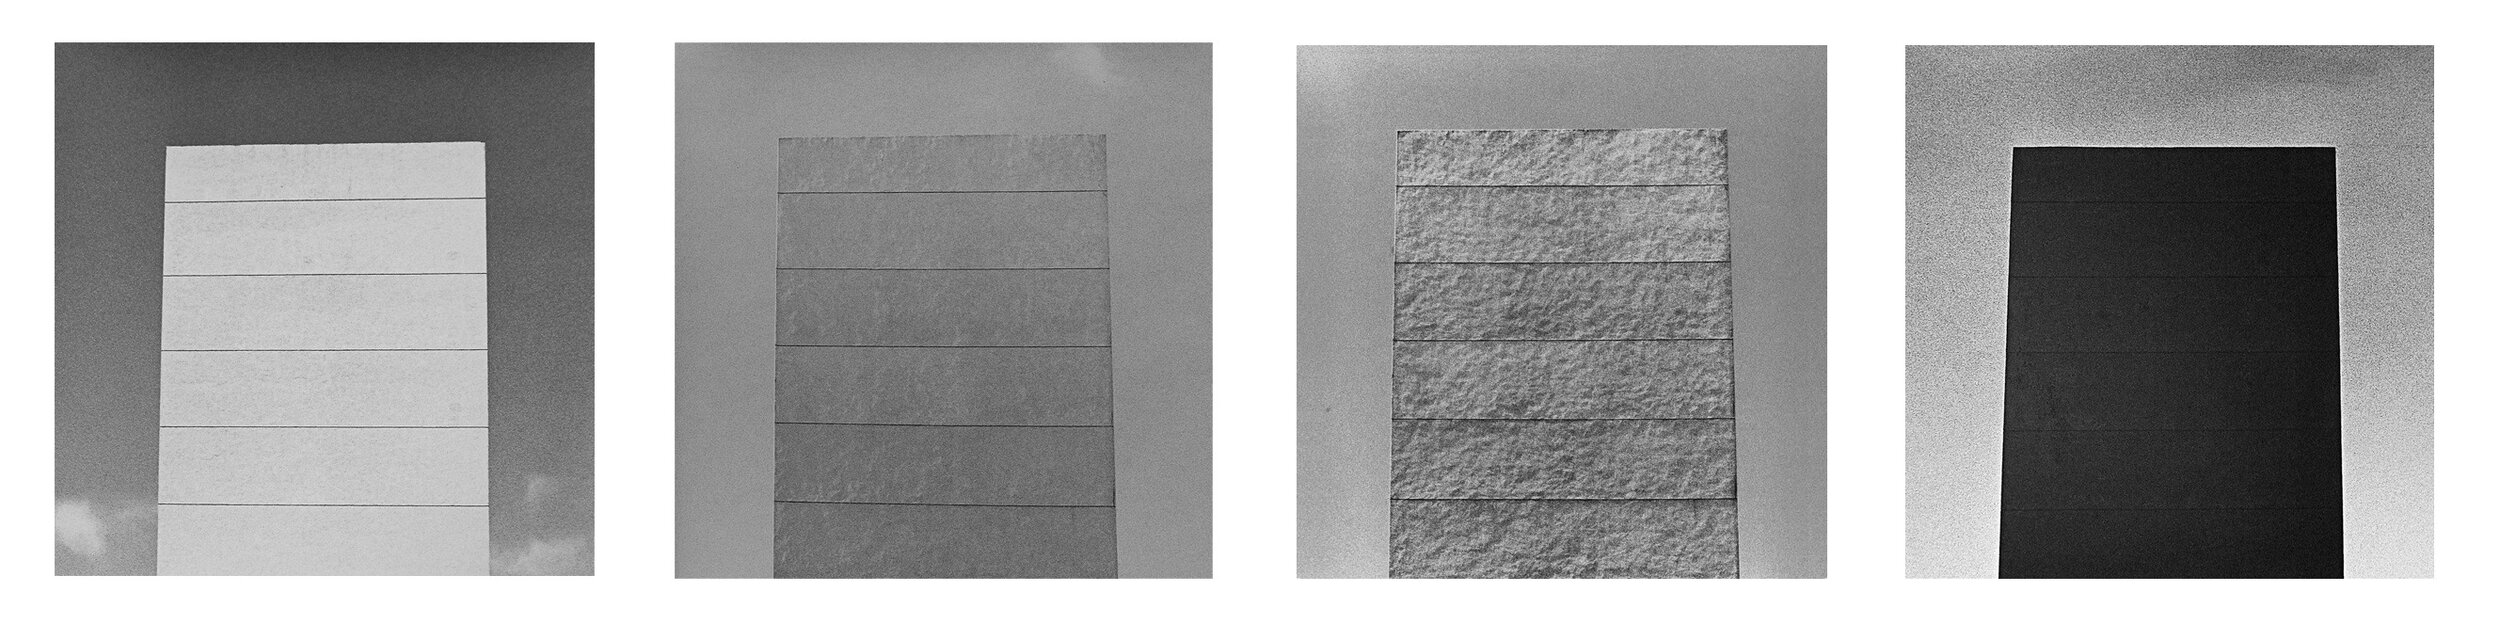 Yannig Hedel - GPR-5 to GPR-13, Pignons rilliards, 1988-1989